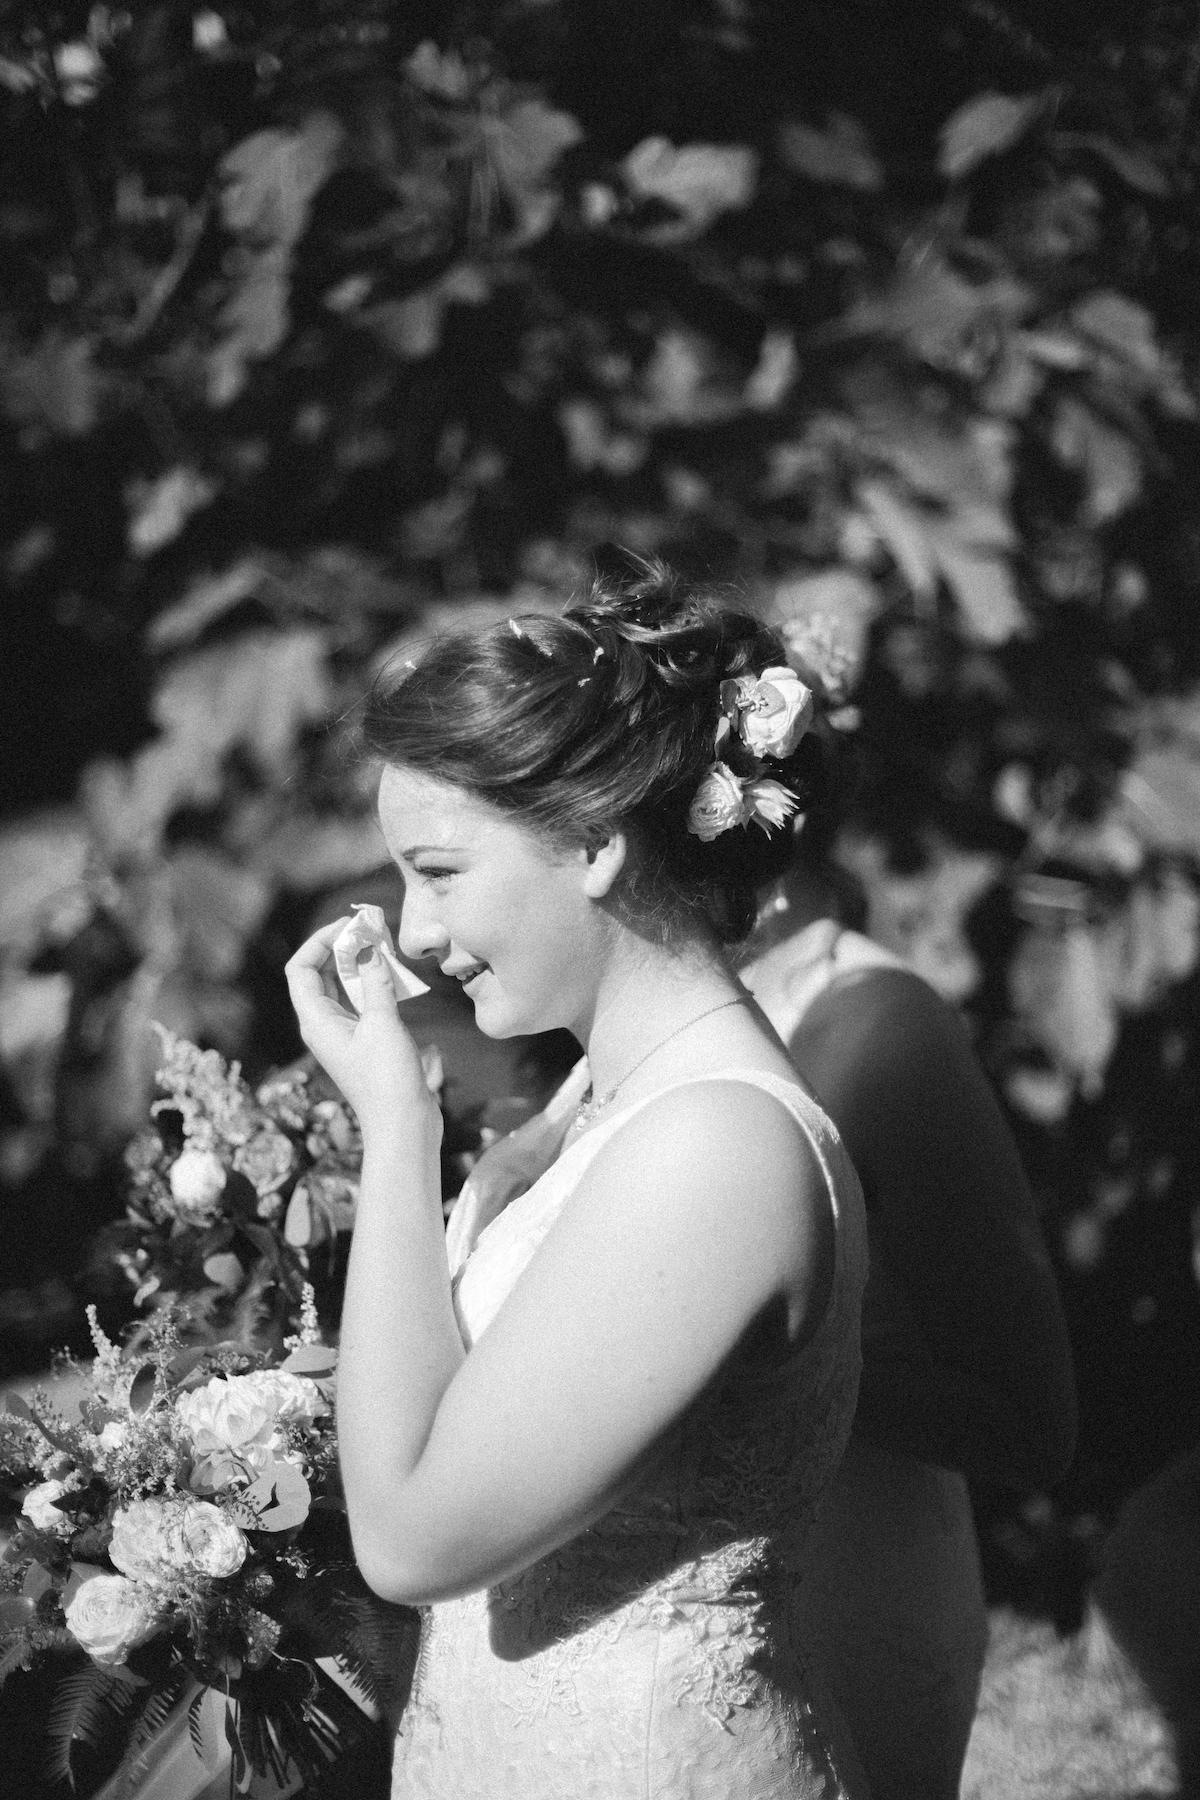 annecy-wedding-photos-147.jpg